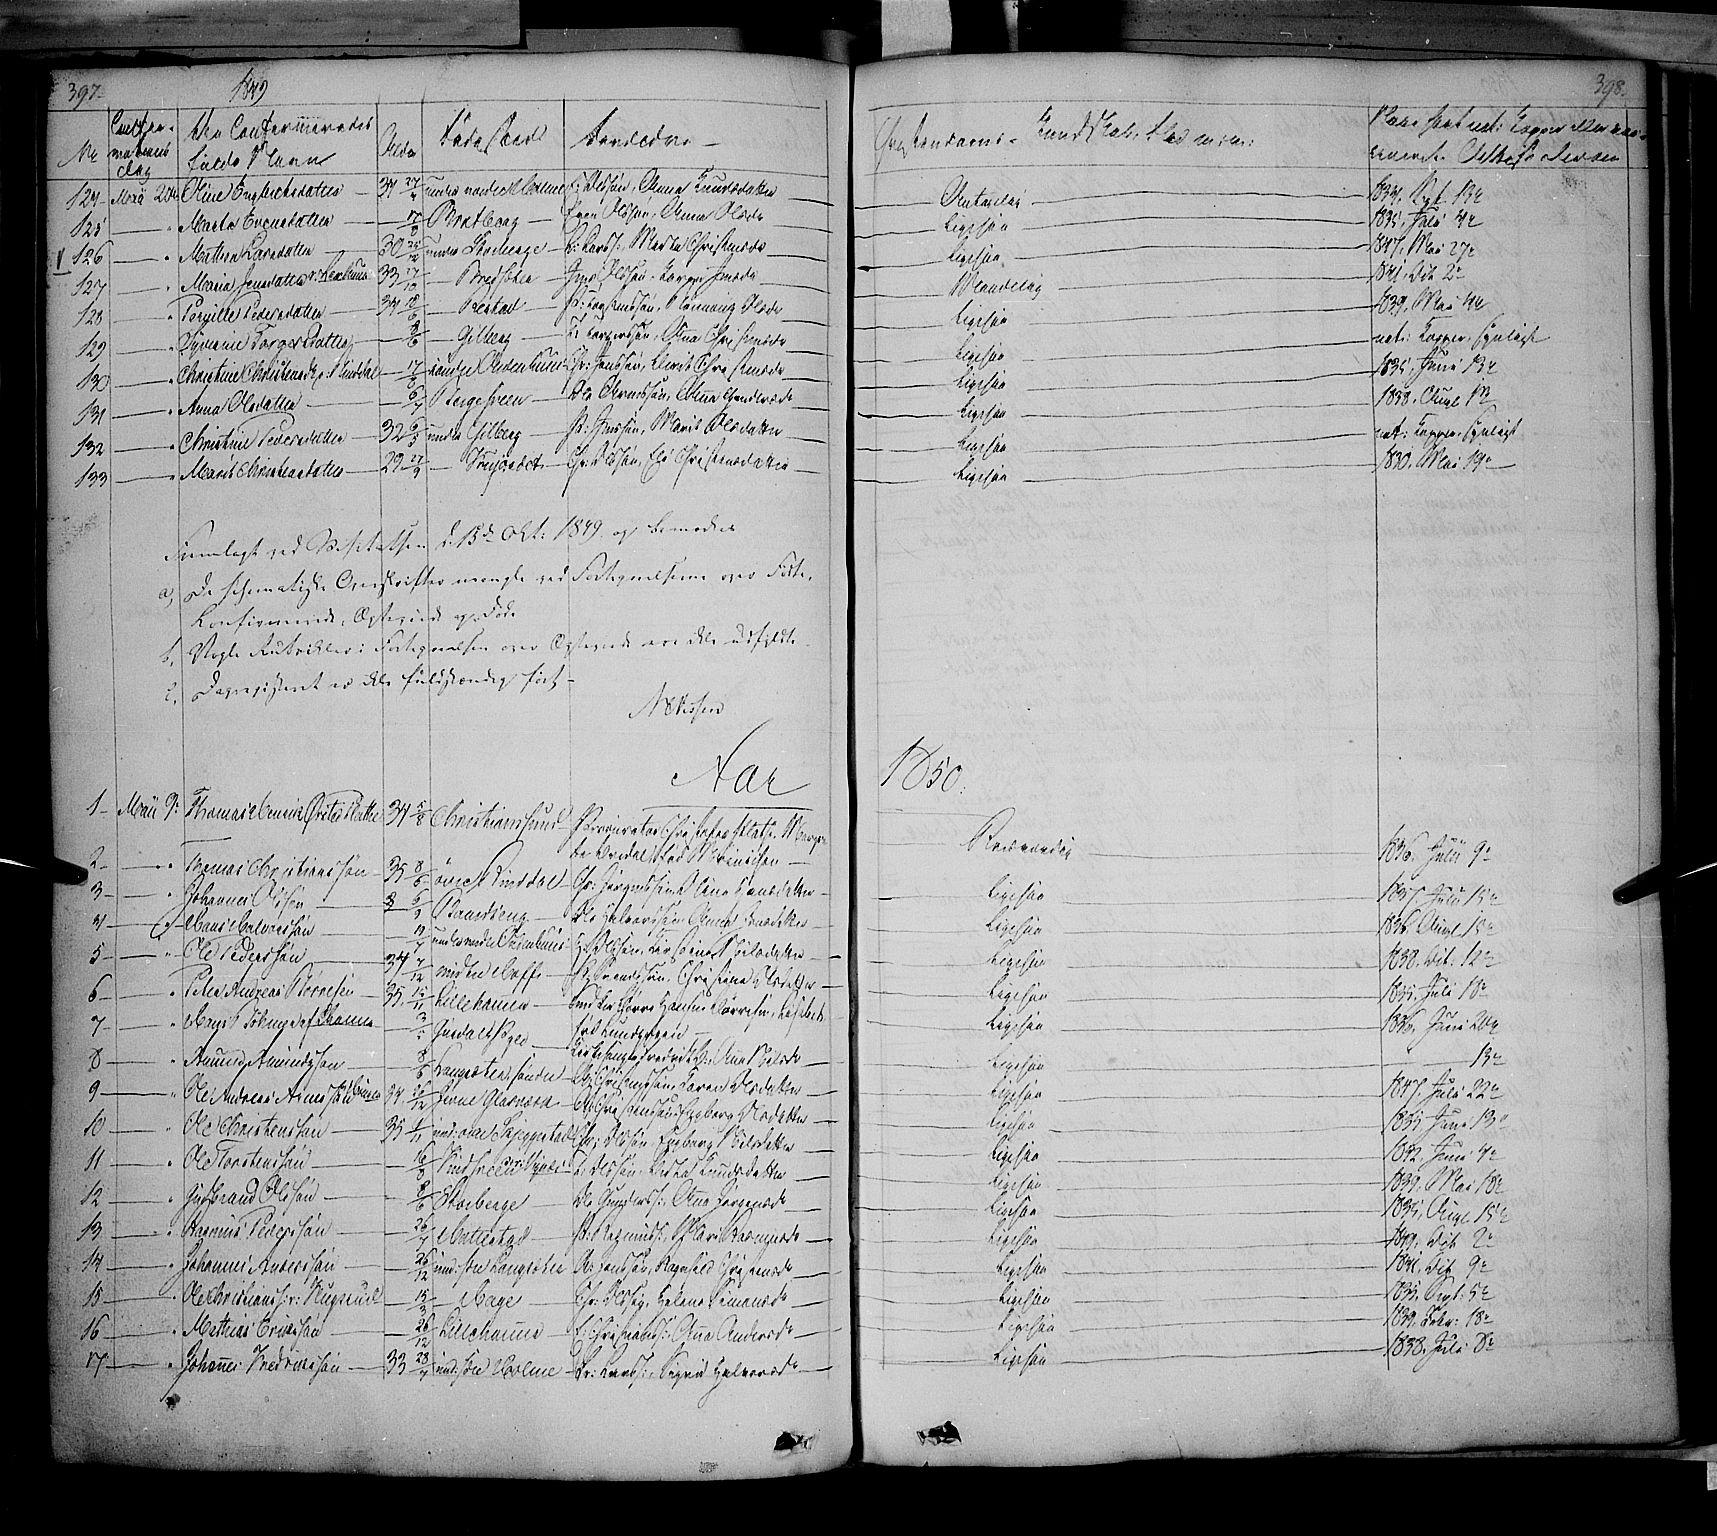 SAH, Fåberg prestekontor, Ministerialbok nr. 5, 1836-1854, s. 397-398